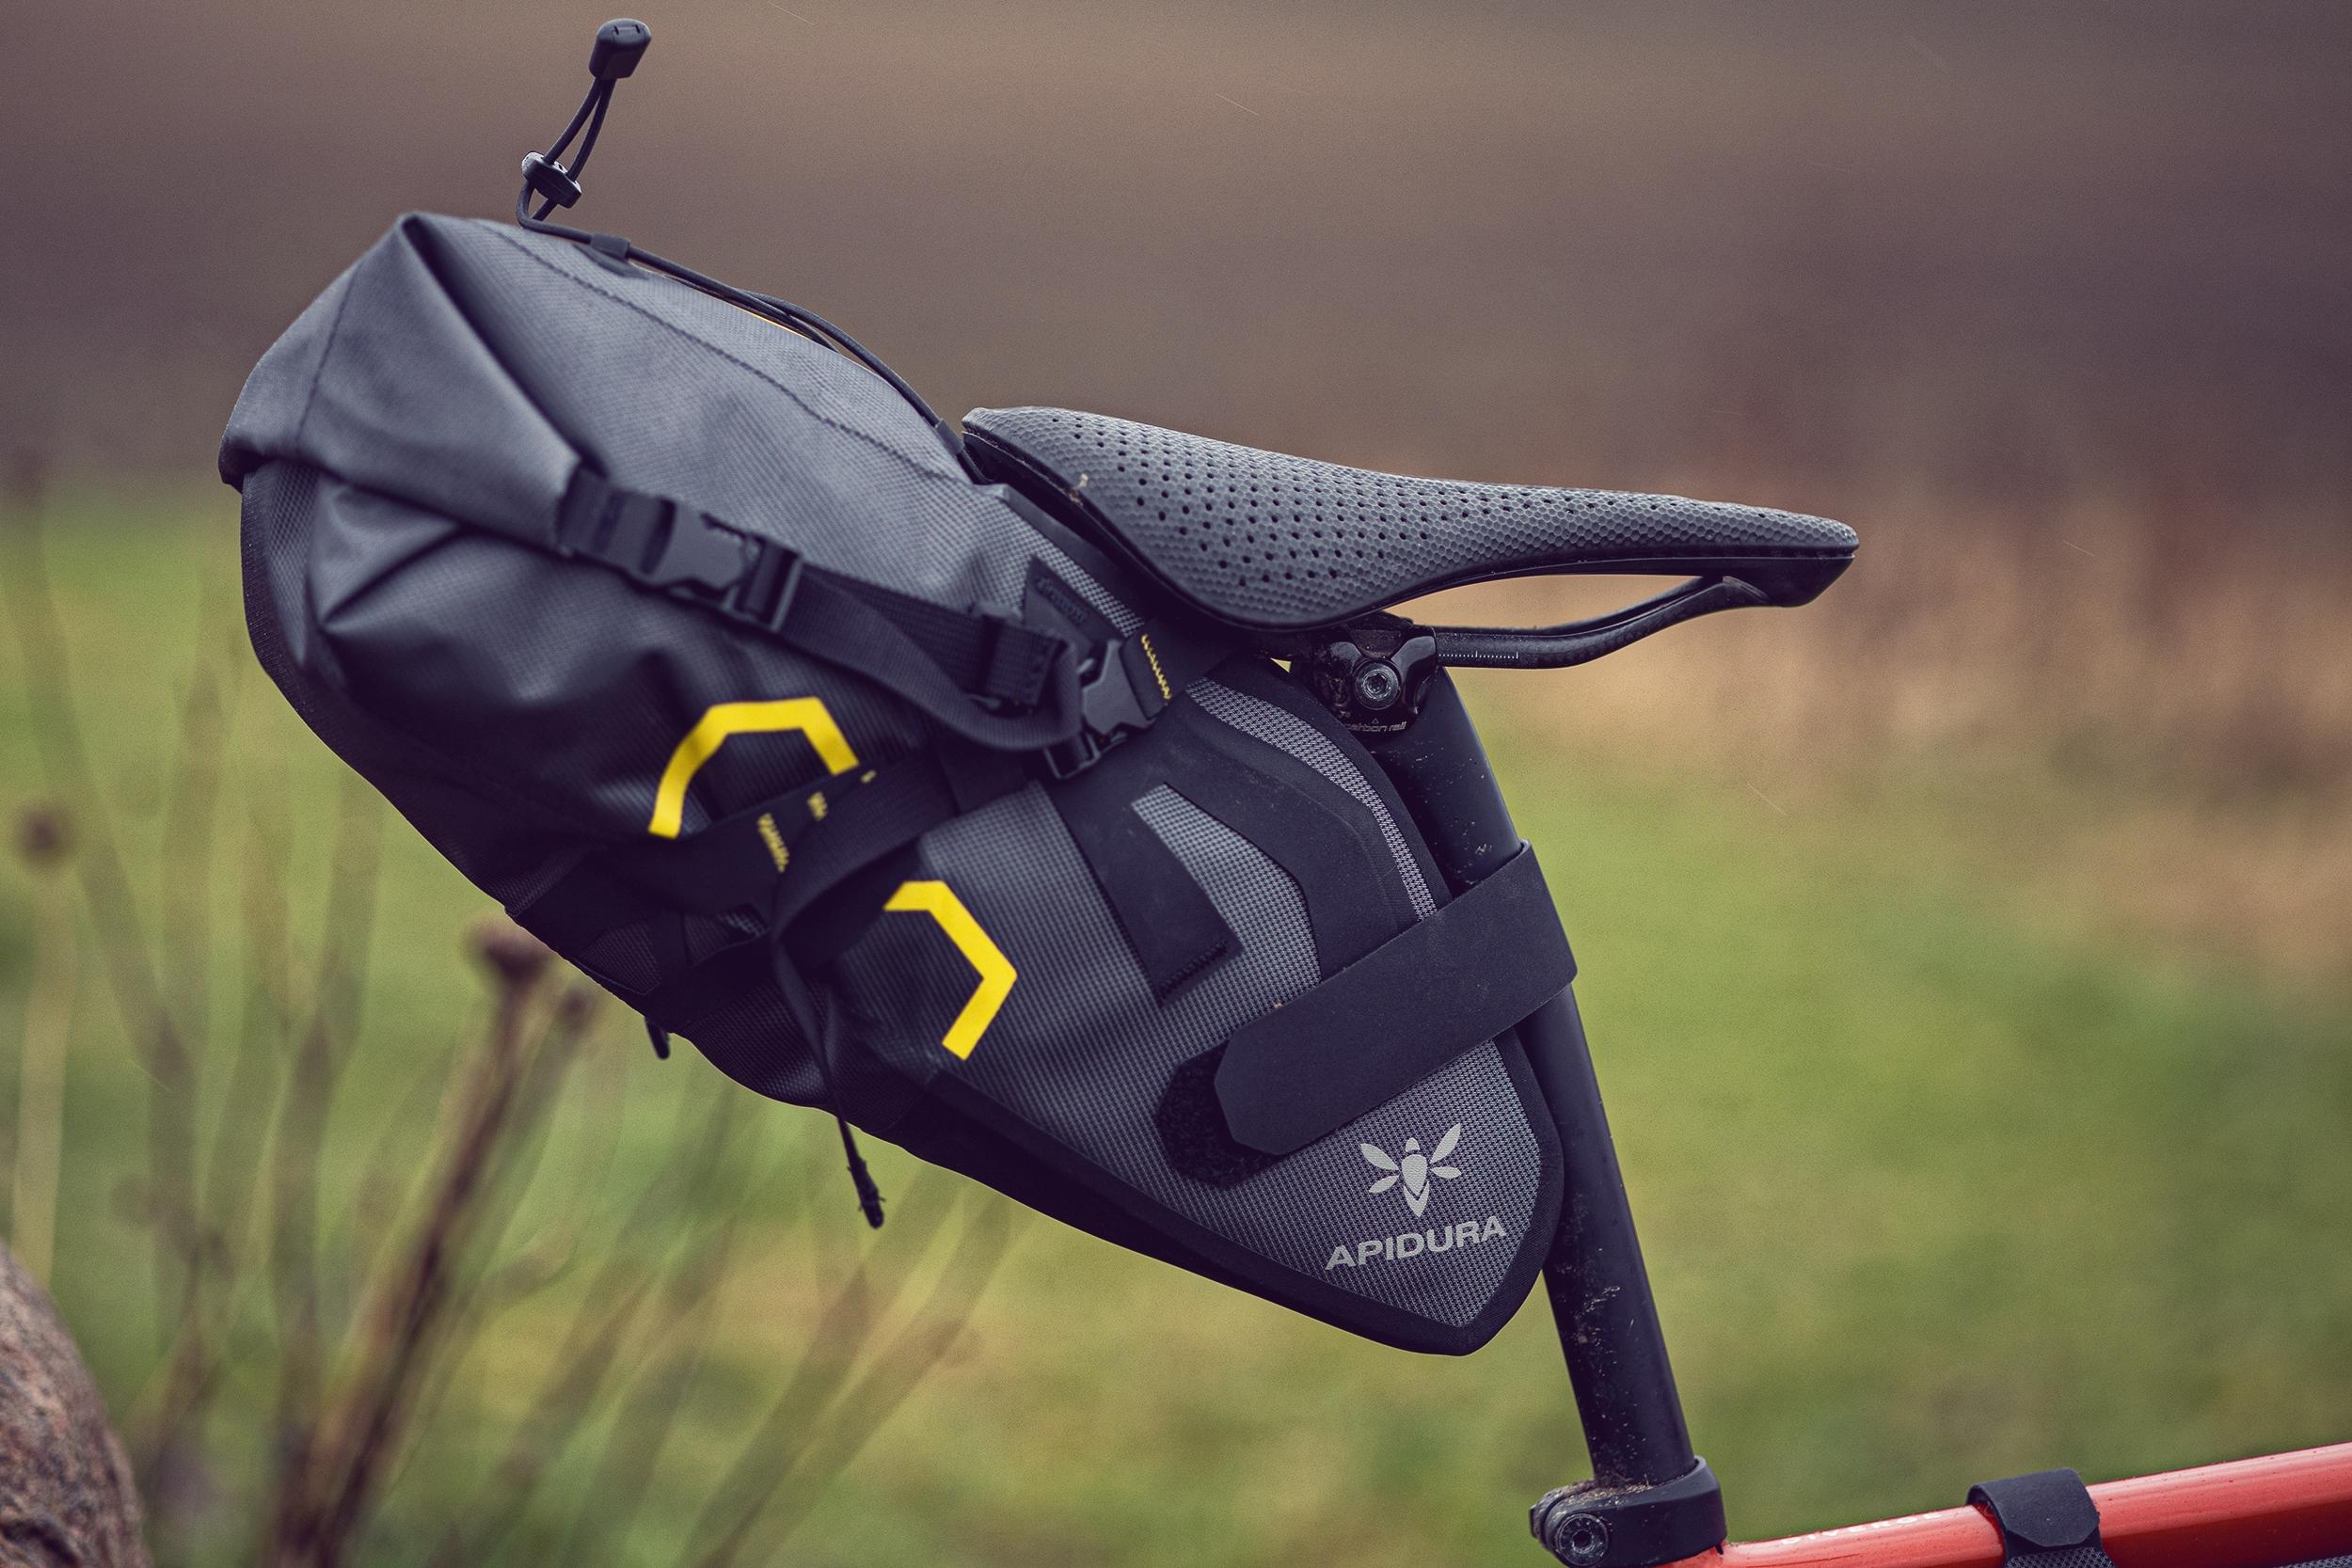 Apidura Expedition Saddle Bag